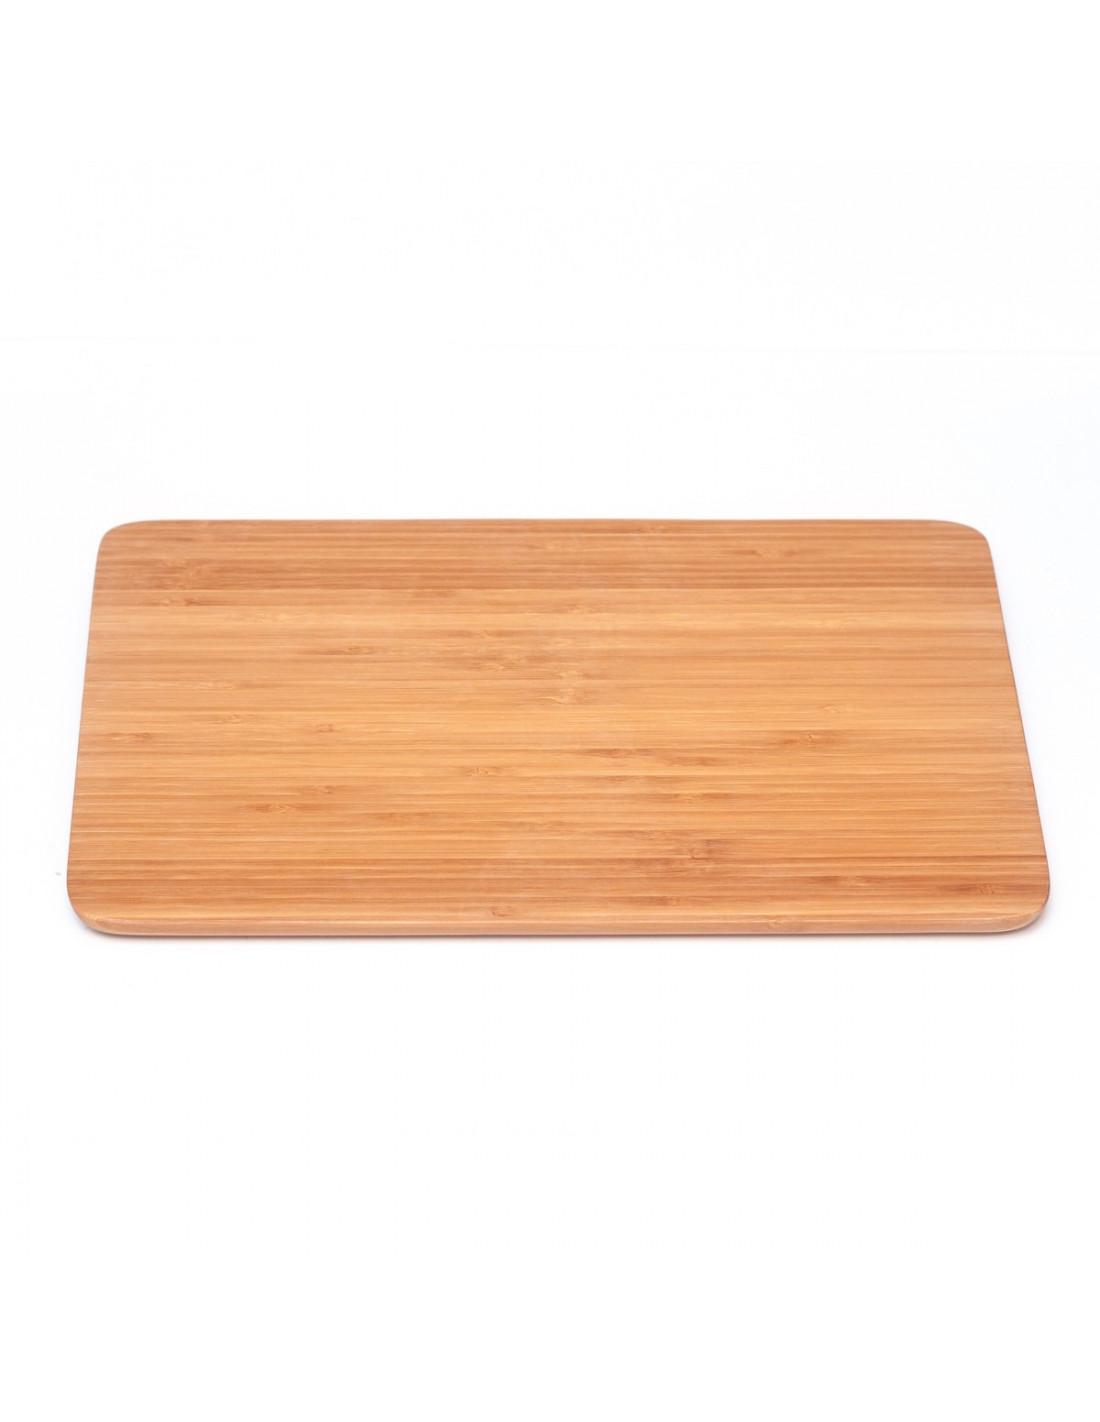 Grote bamboe snijplank met afgeronde hoeken houten accessoires en meer - Afgeronde bank ...